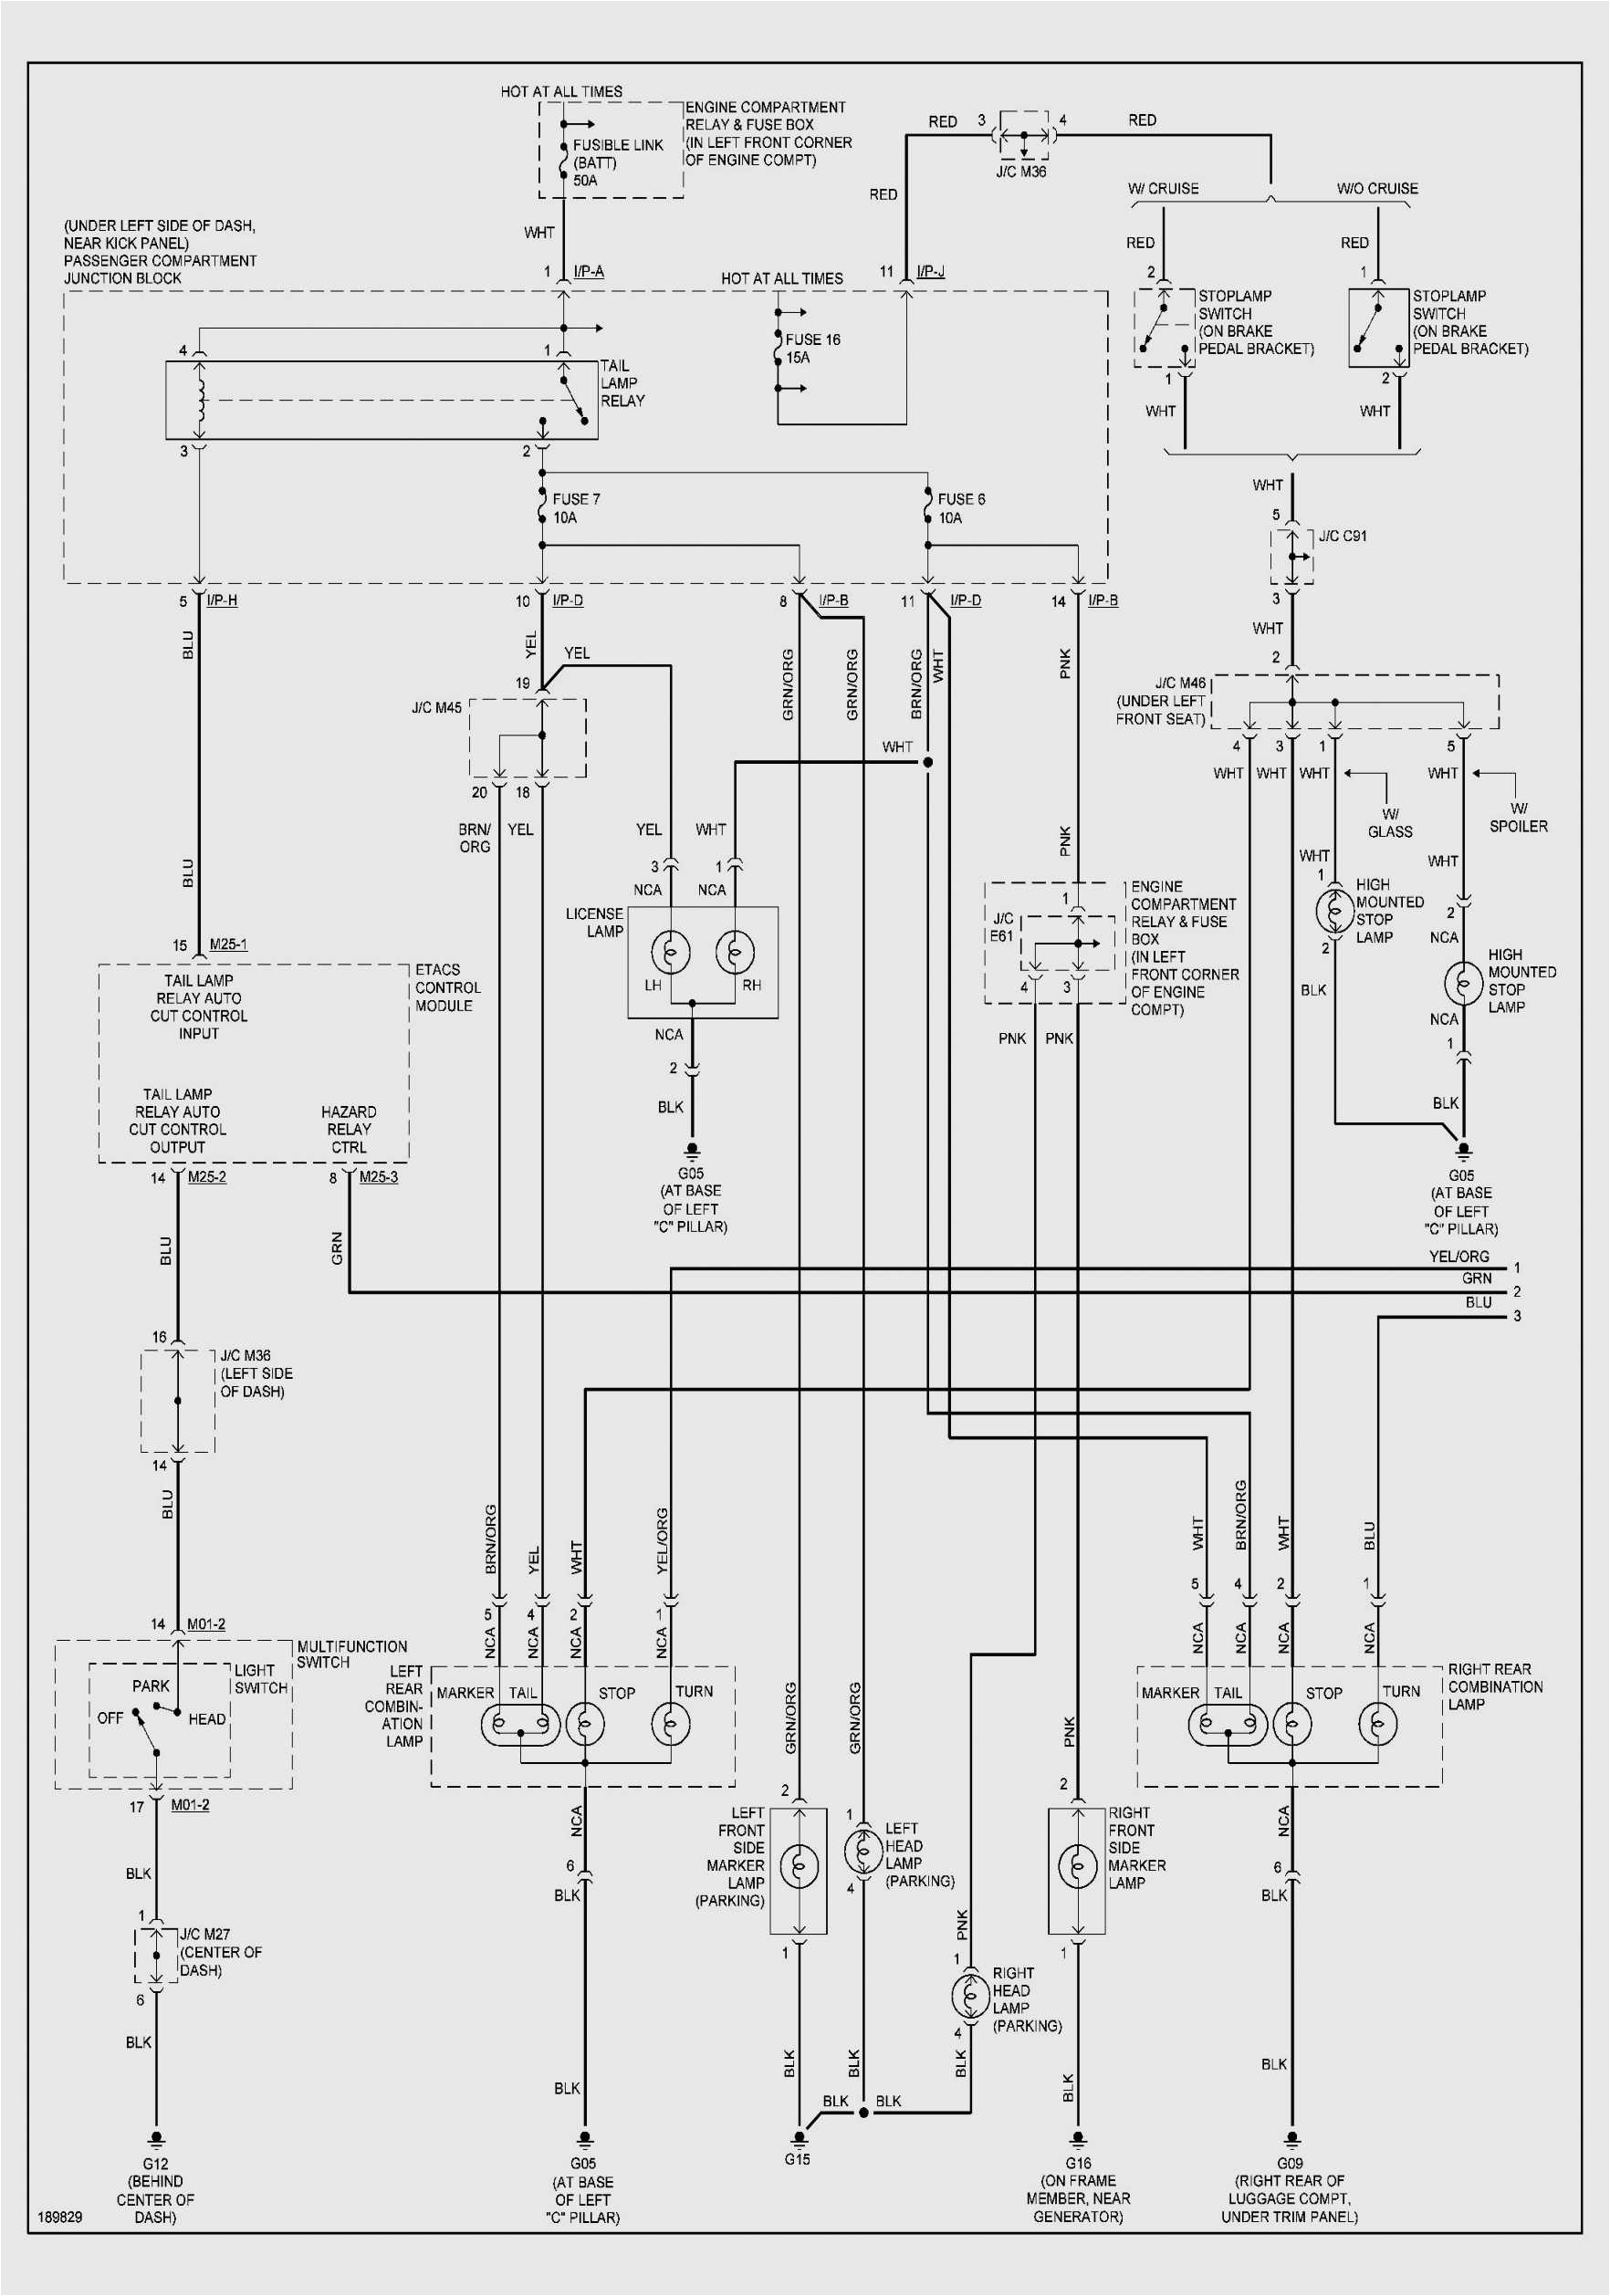 2013 hyundai genesis wiring diagram wiring diagram view 2013 hyundai genesis wiring harness diagram